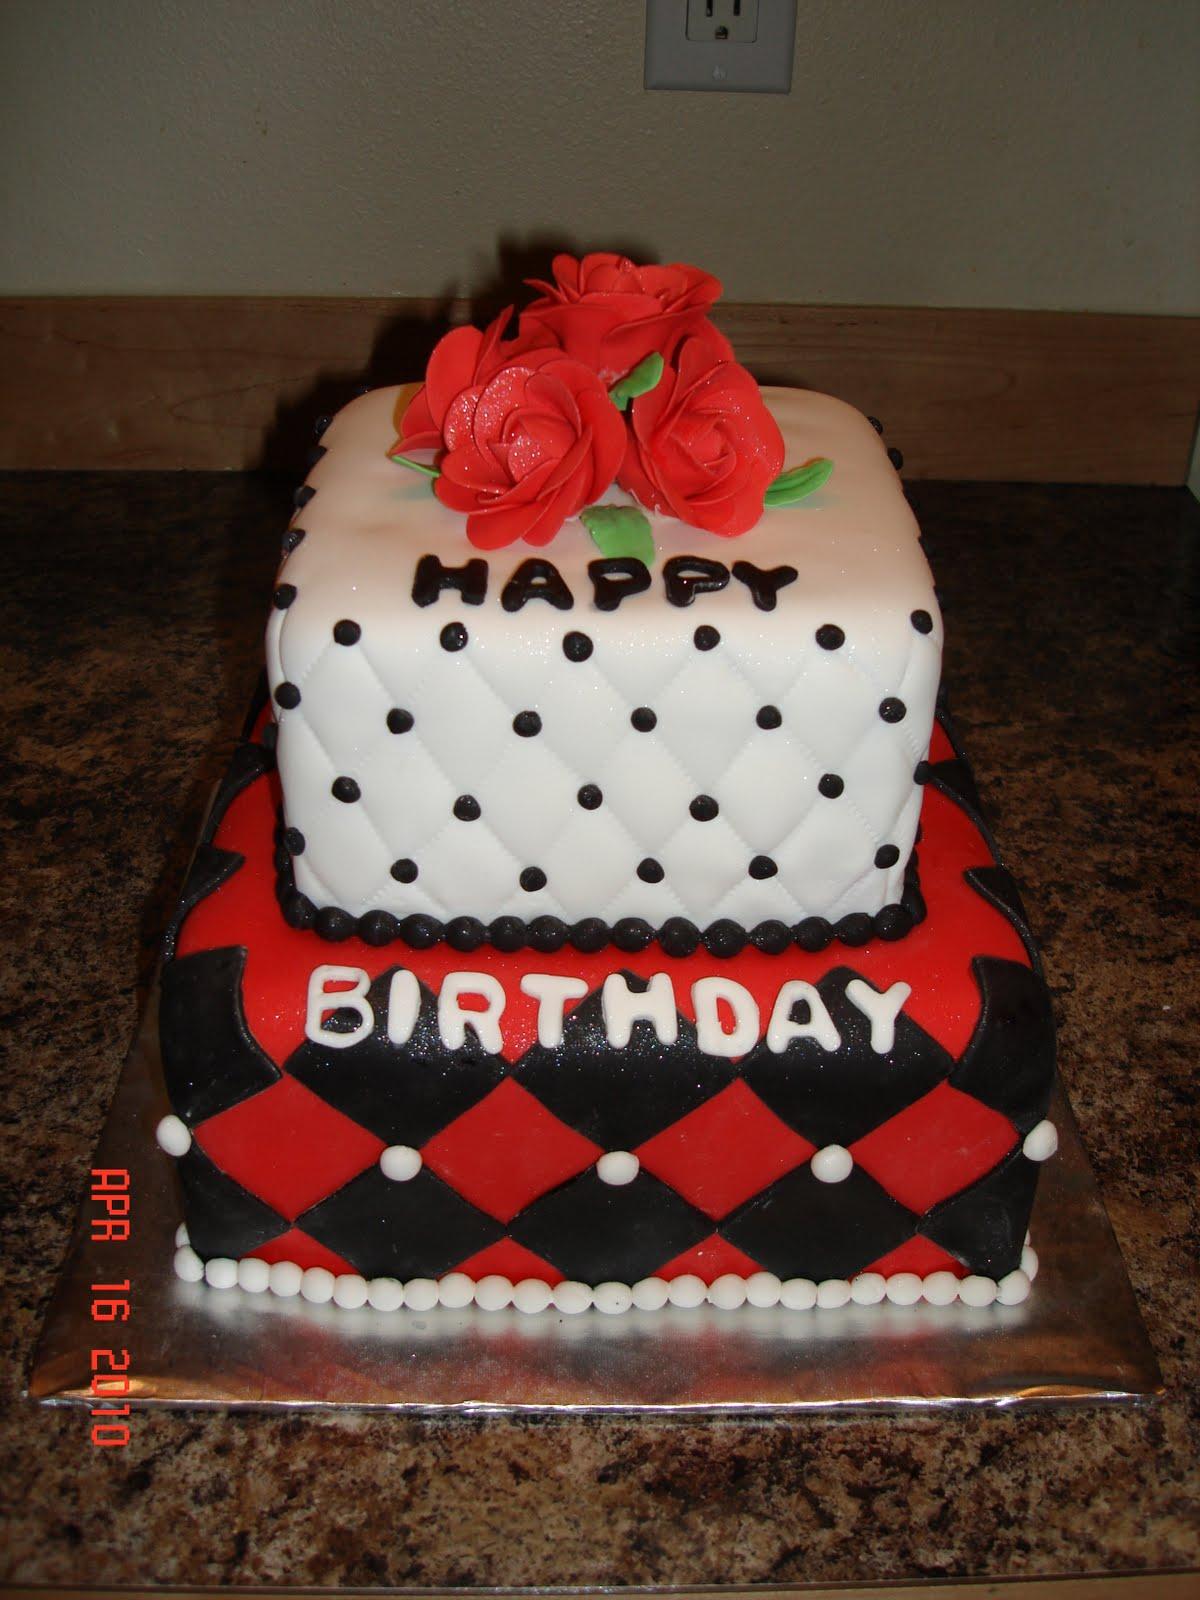 Custom Cakes By Denise: Red Roses Happy Birthday